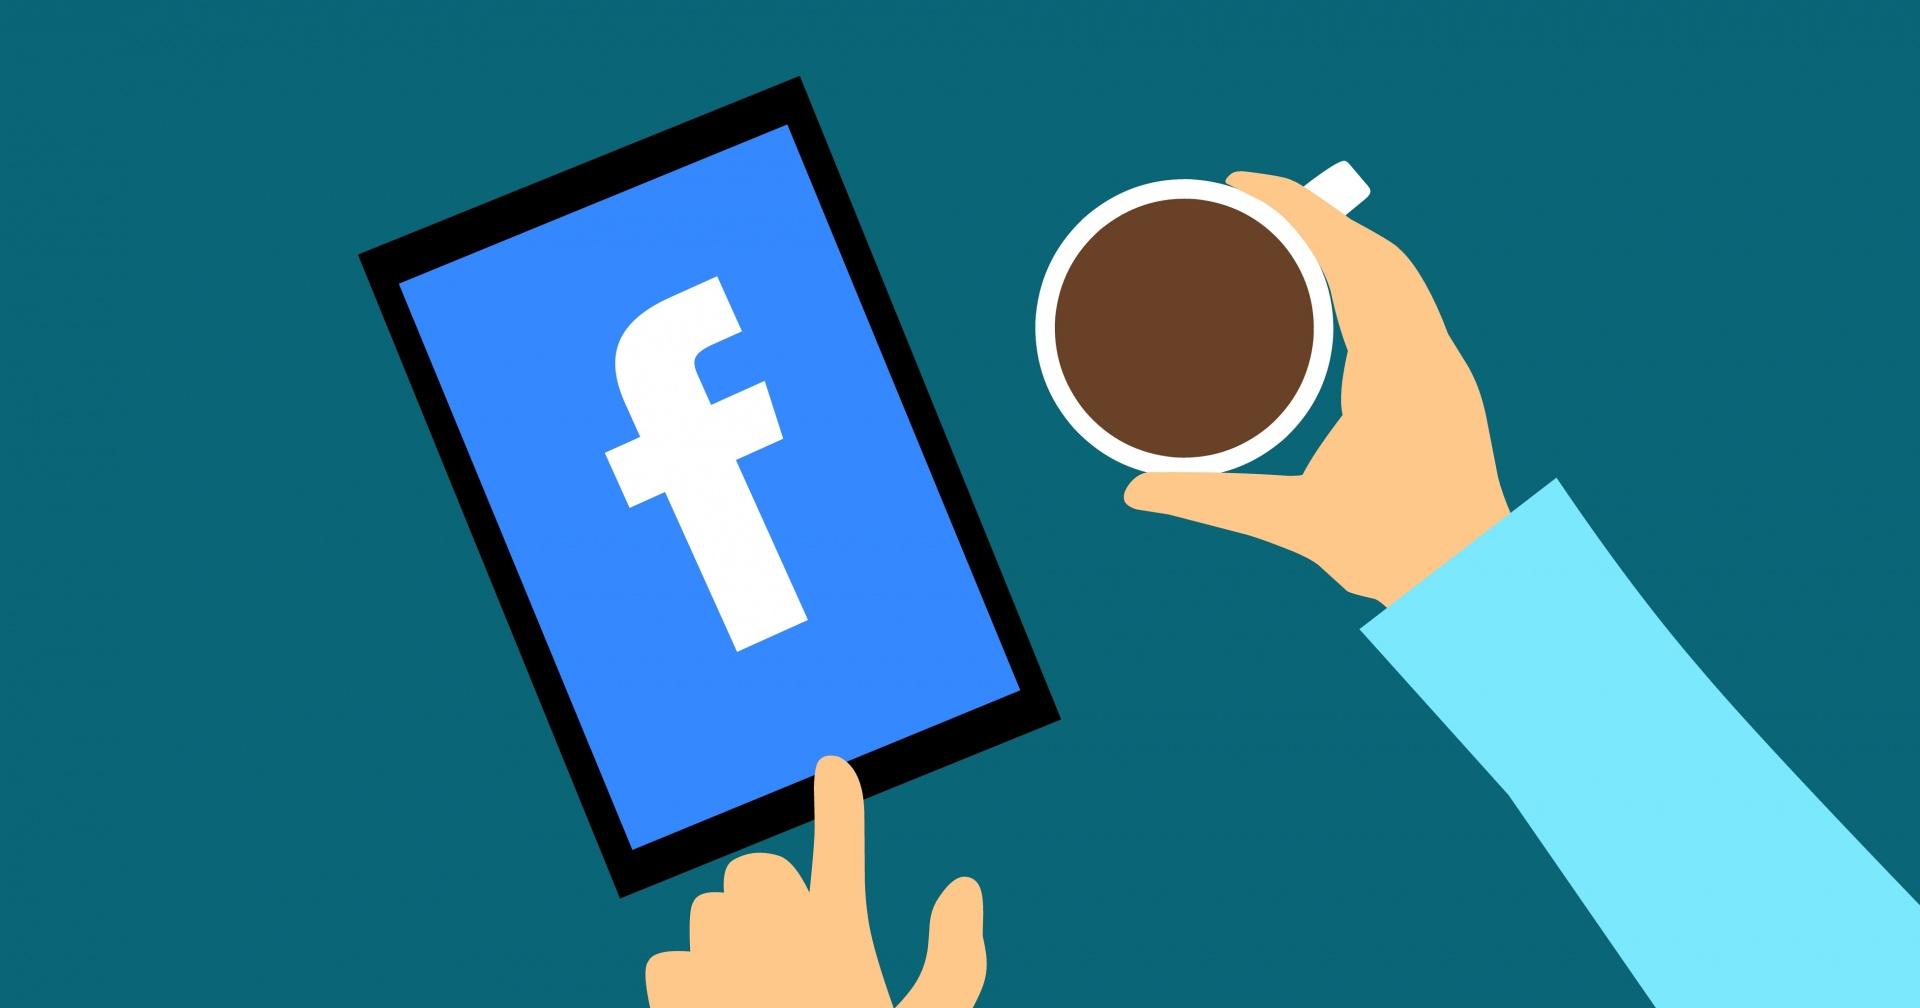 Facebook, nuovo scandalo sui dati: ceduti ad aziende cinesi